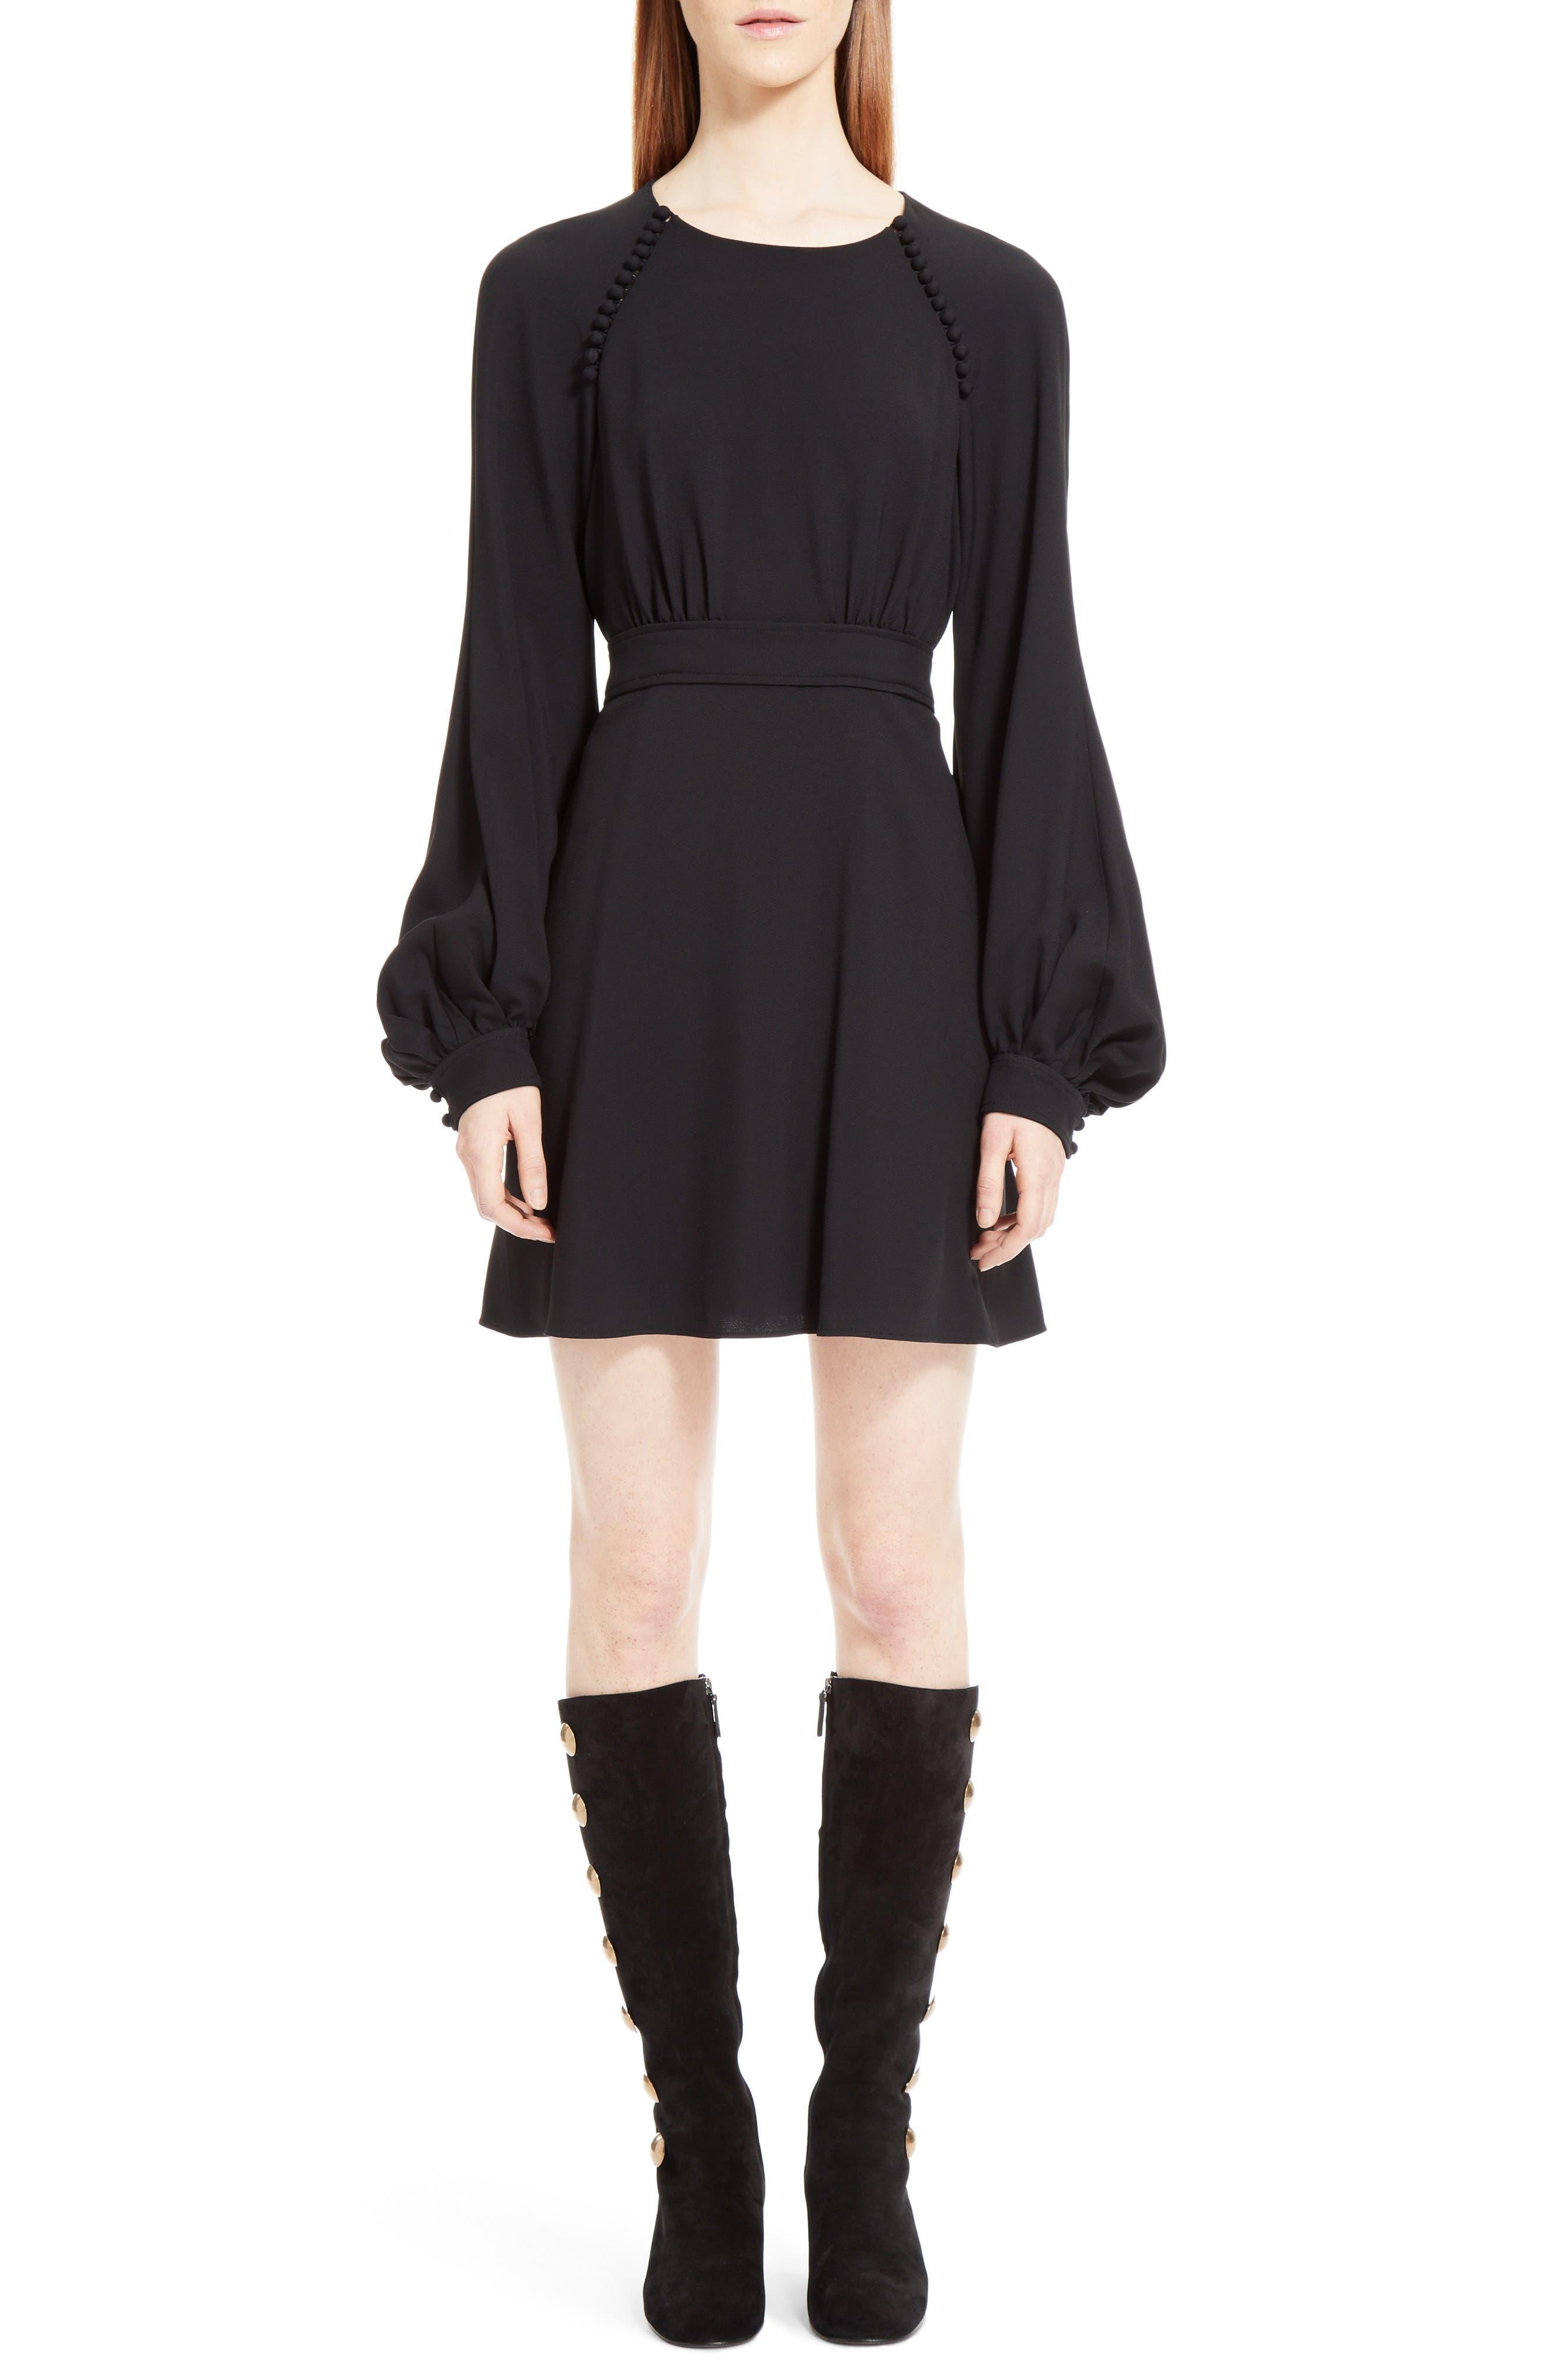 Alternate Image 1 Selected - Chloé Cady Bell Sleeve Dress